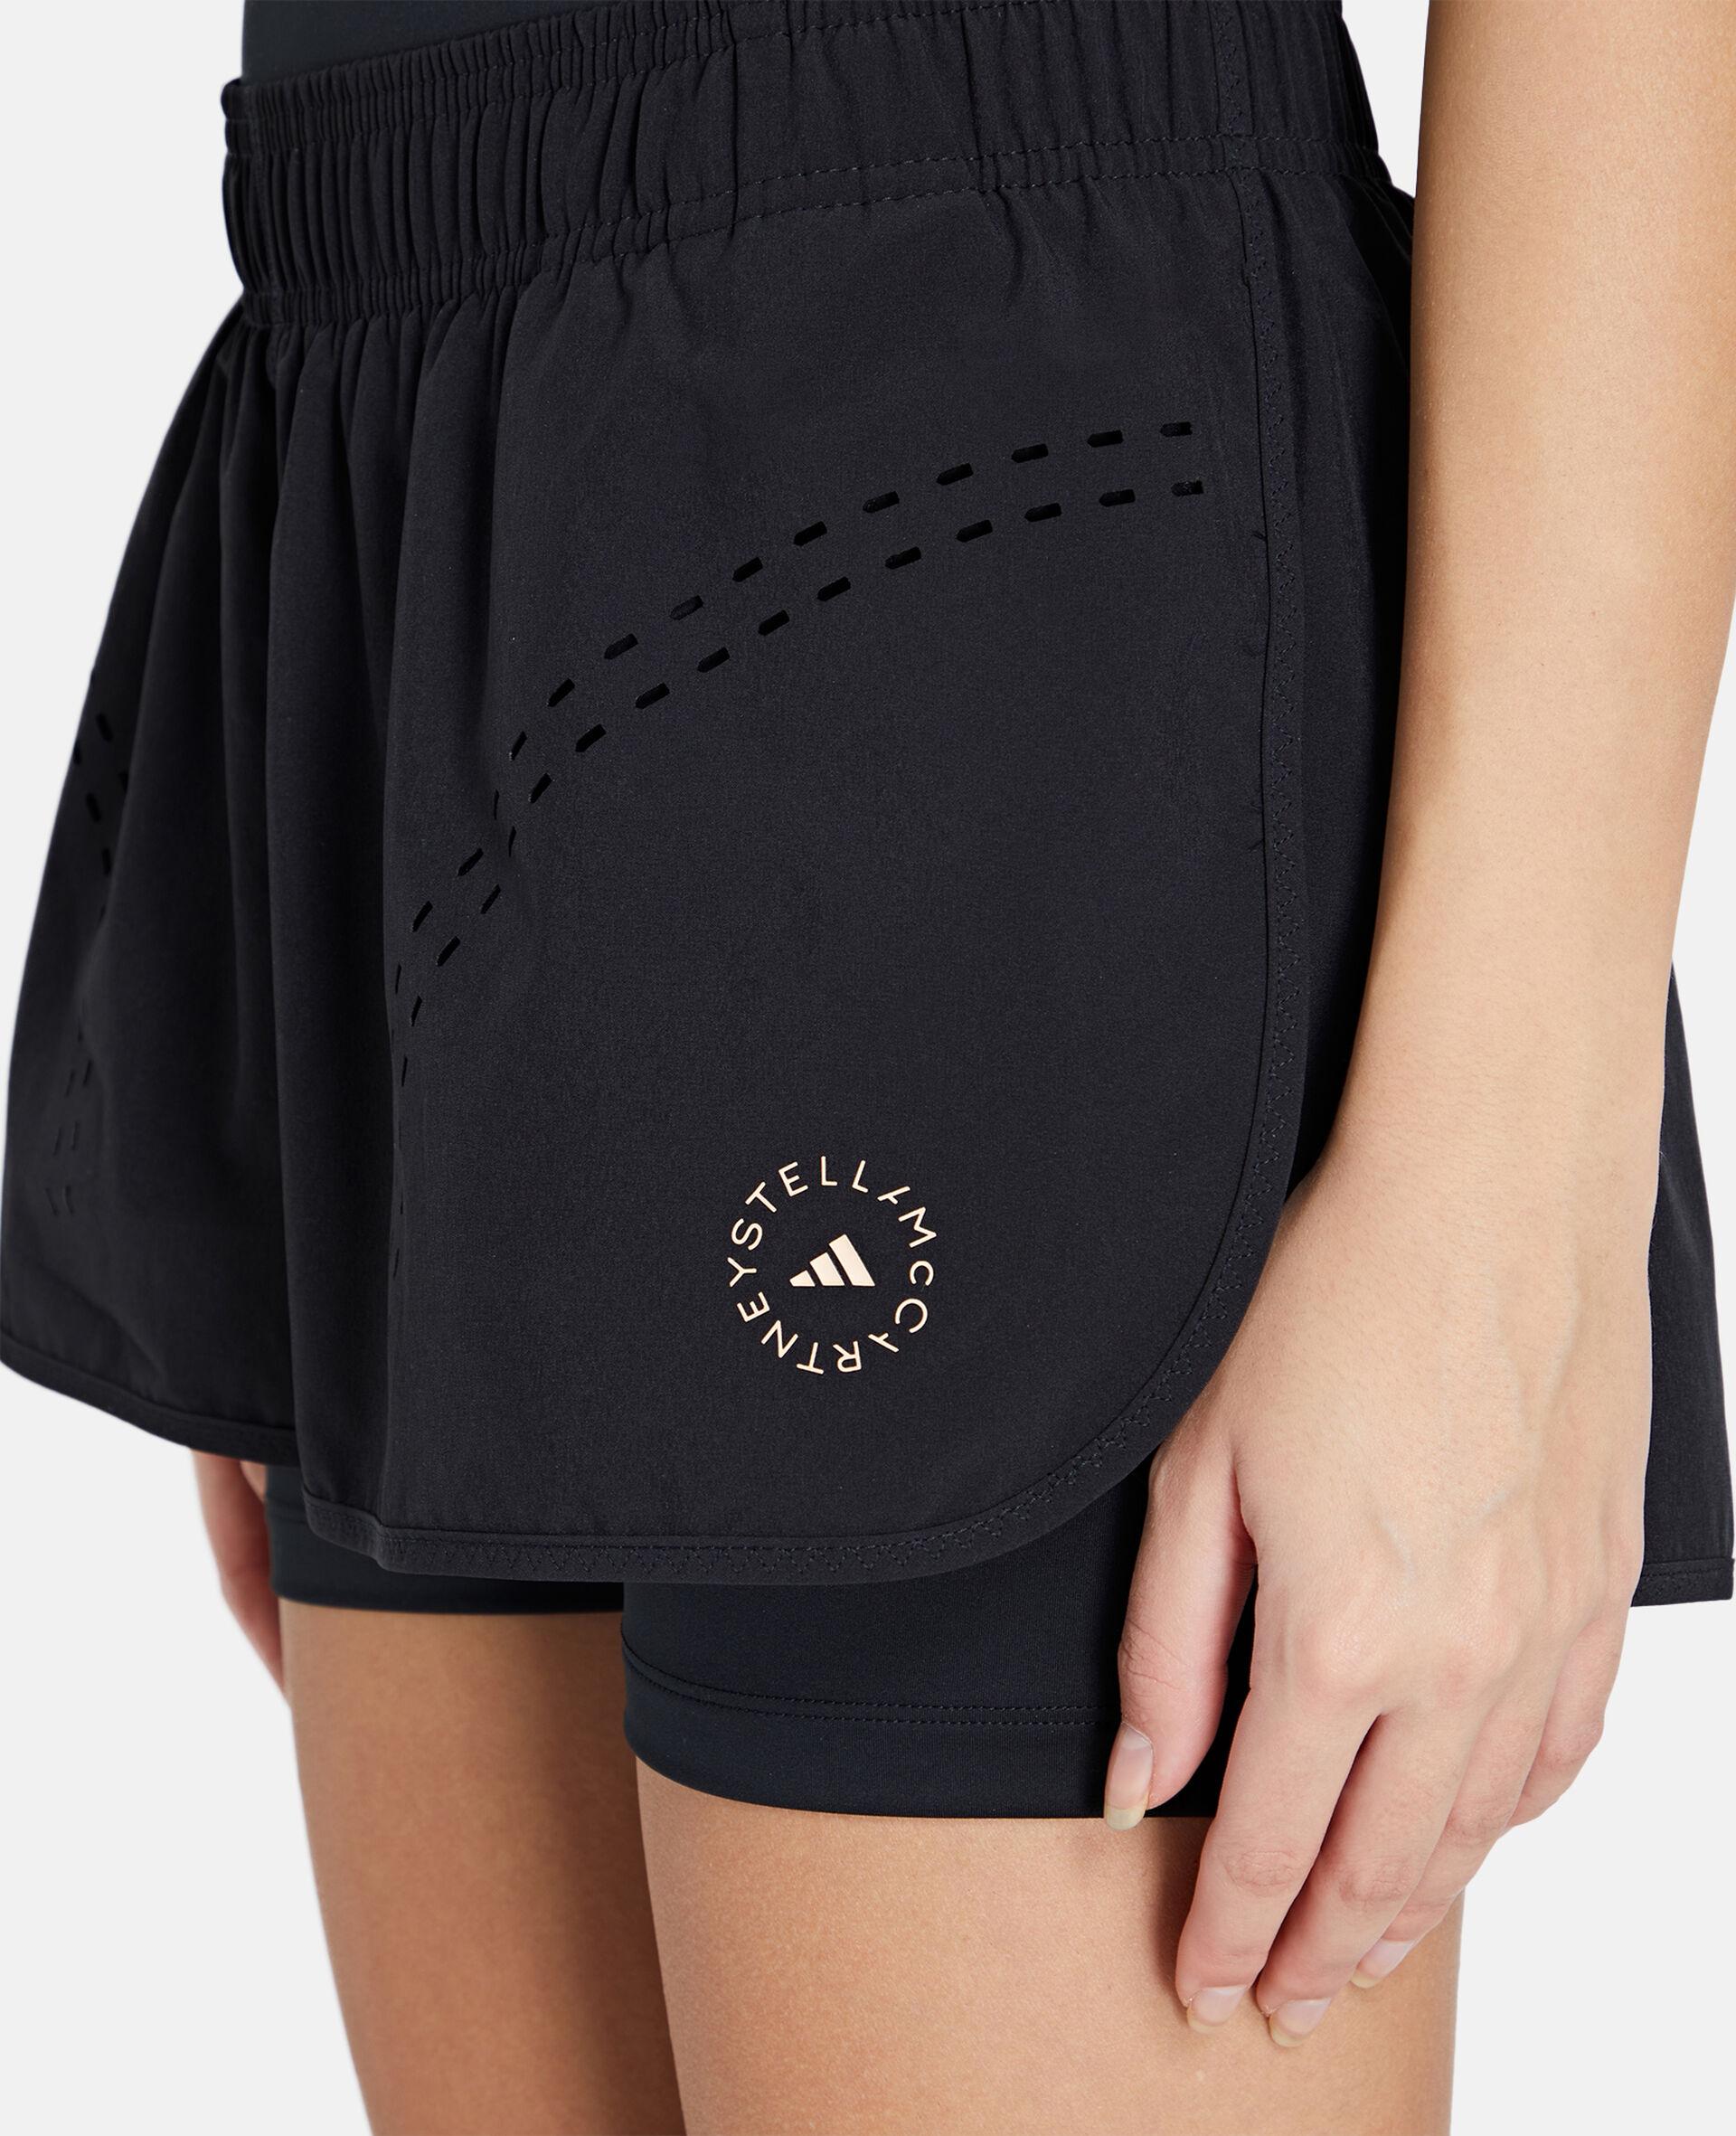 Schwarze TruePurpose Sport-Shorts-Schwarz-large image number 3